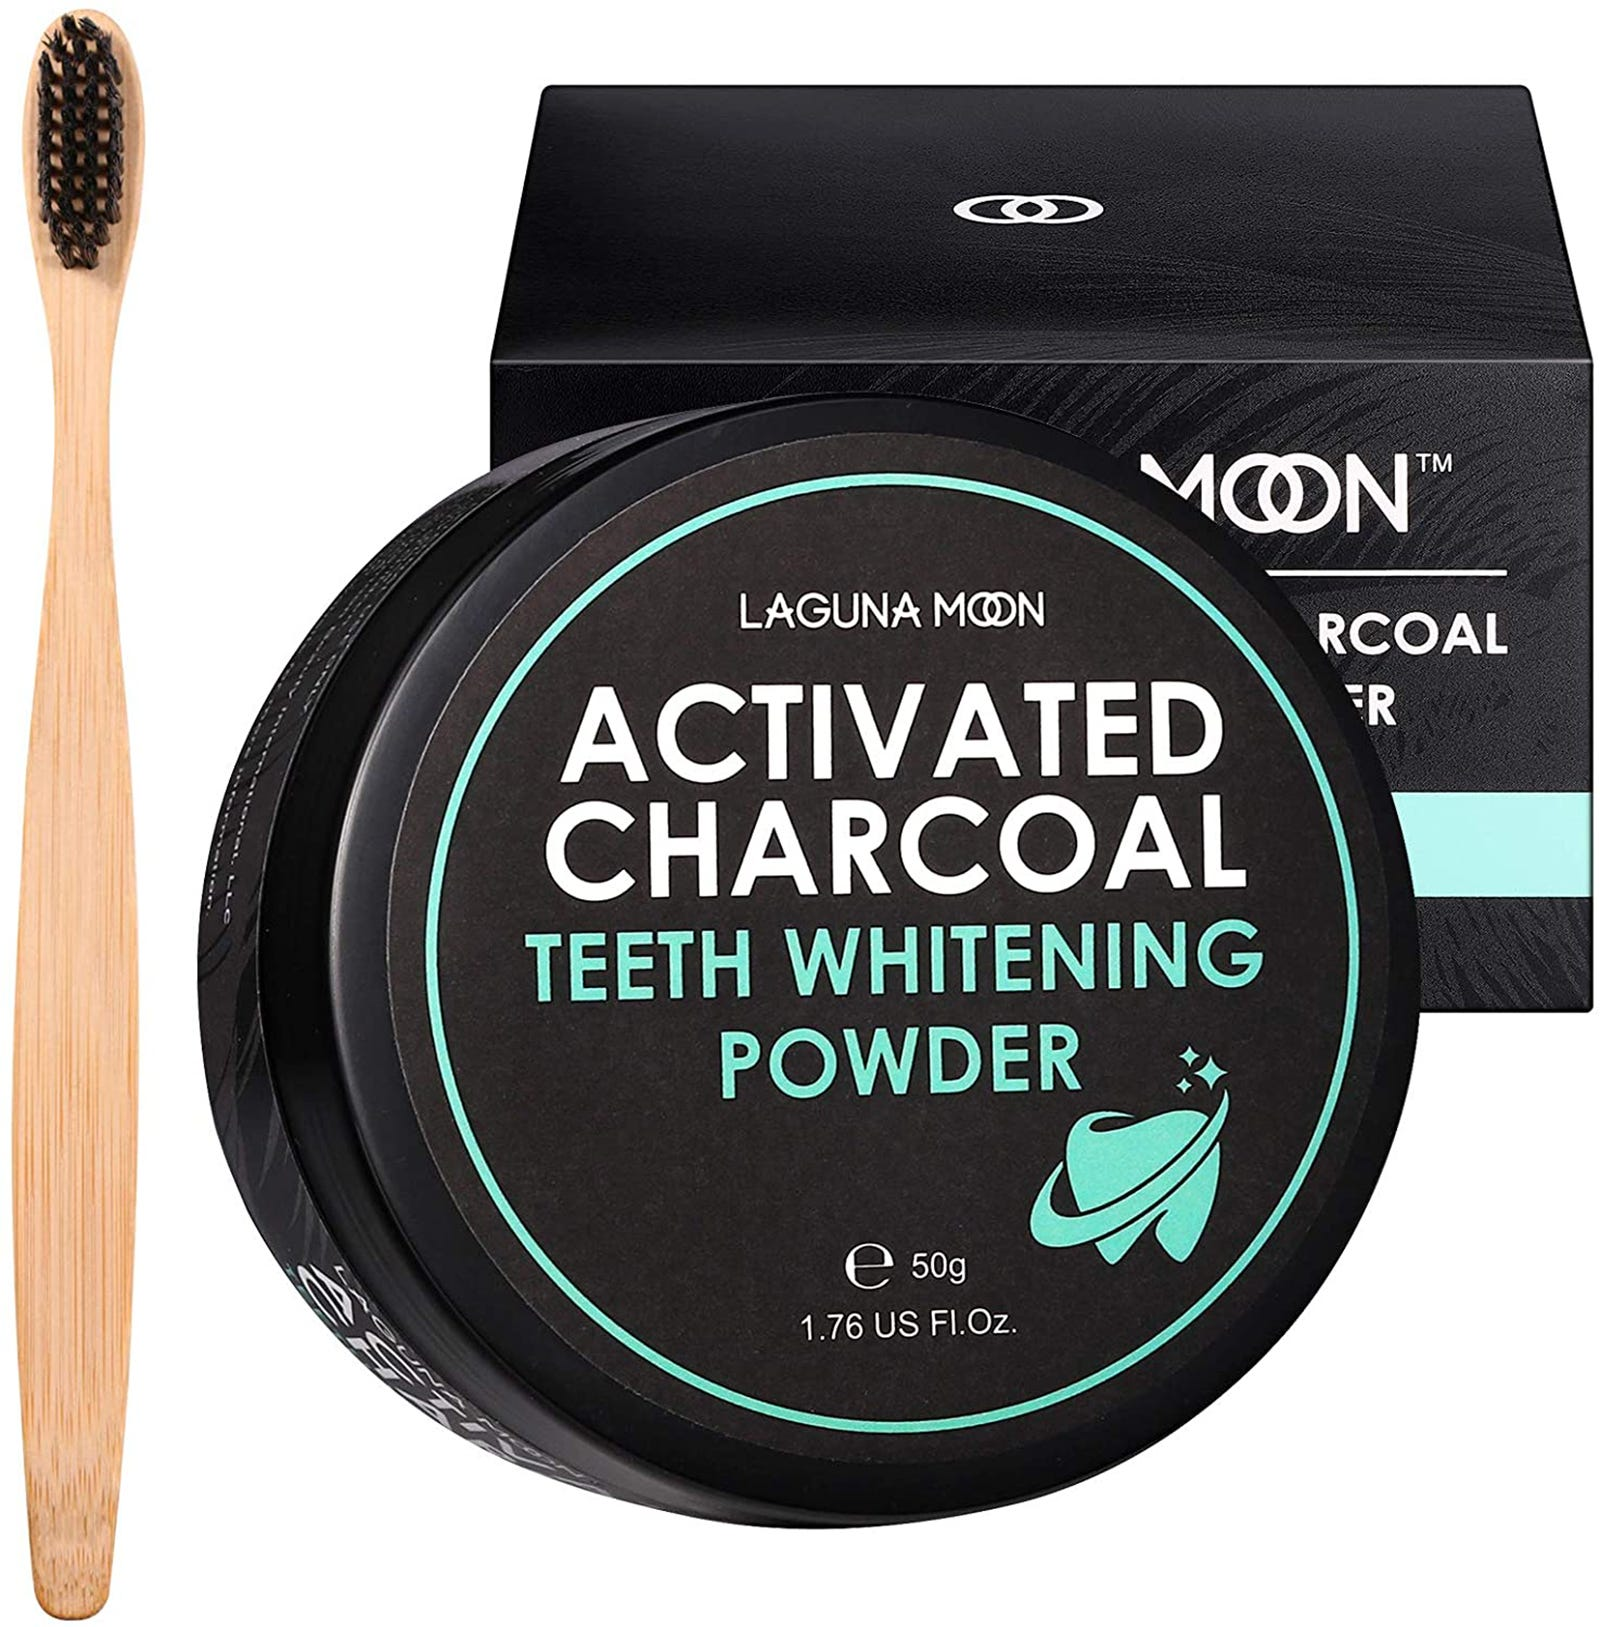 Laguna Moon's activated charcoal powder box and bamboo toothbrush.